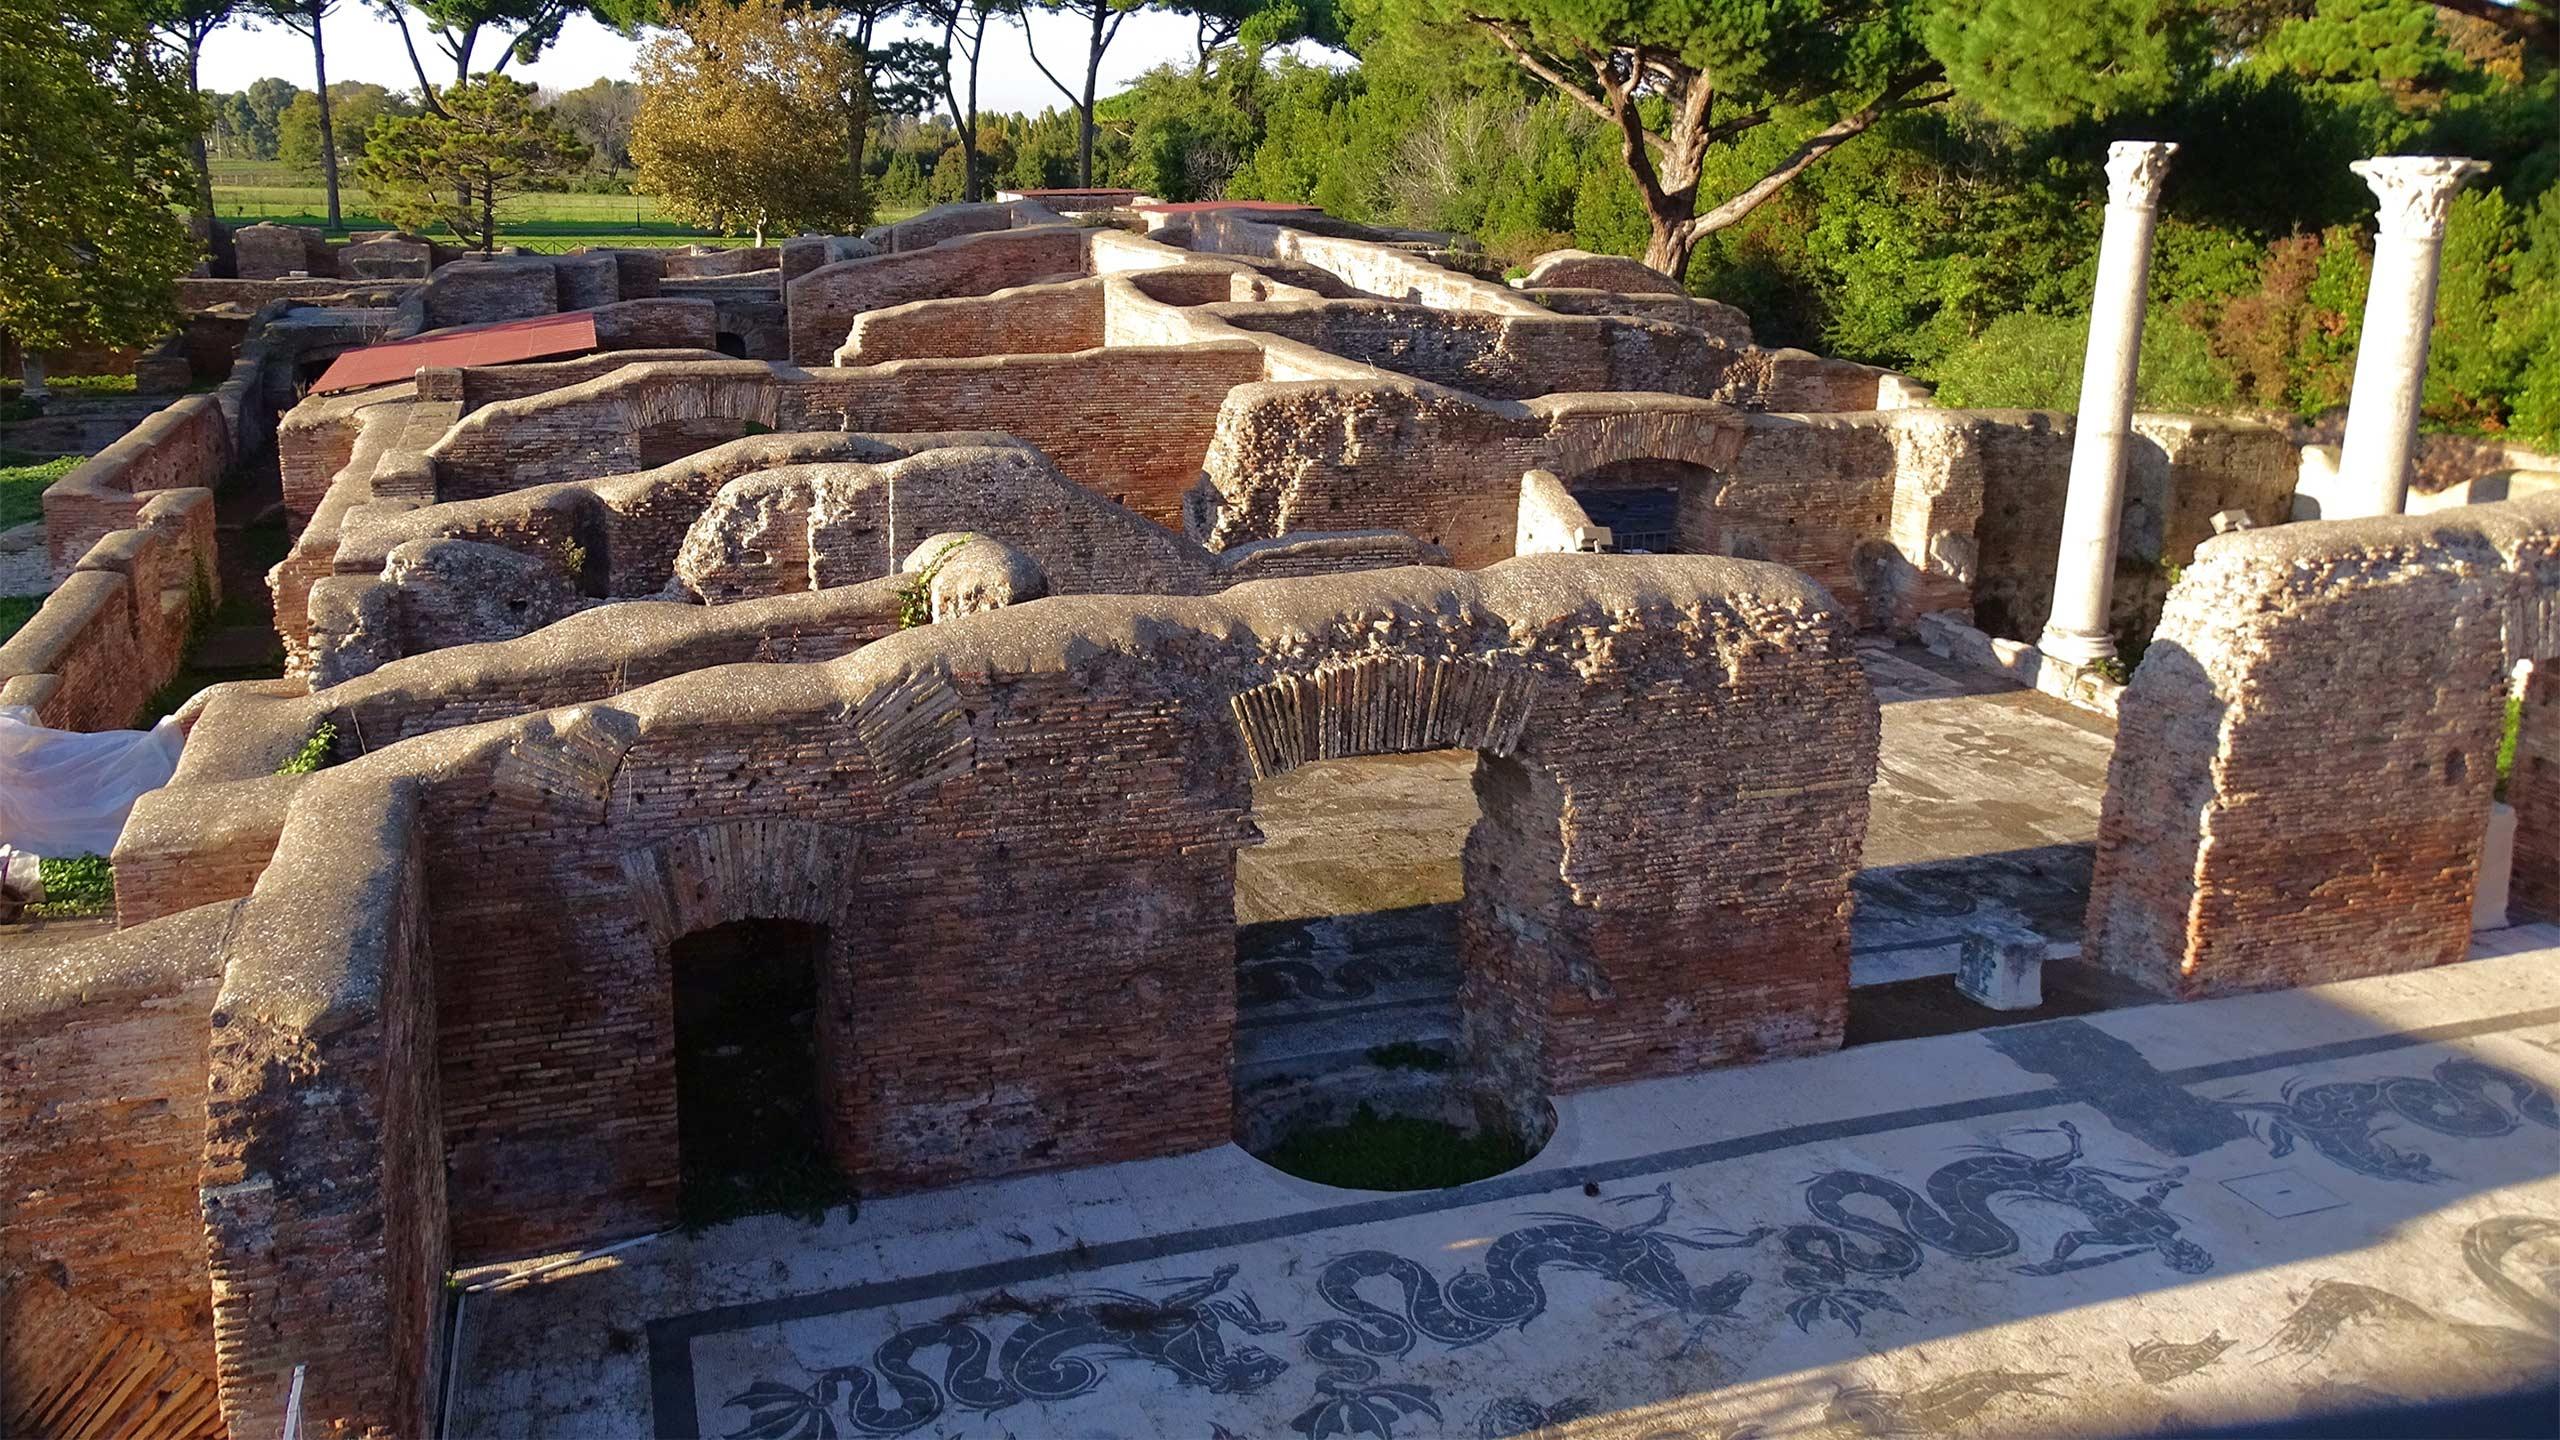 Blog-Quarta-Hospitality-in-Rome-Hotel-Oxford-Roma